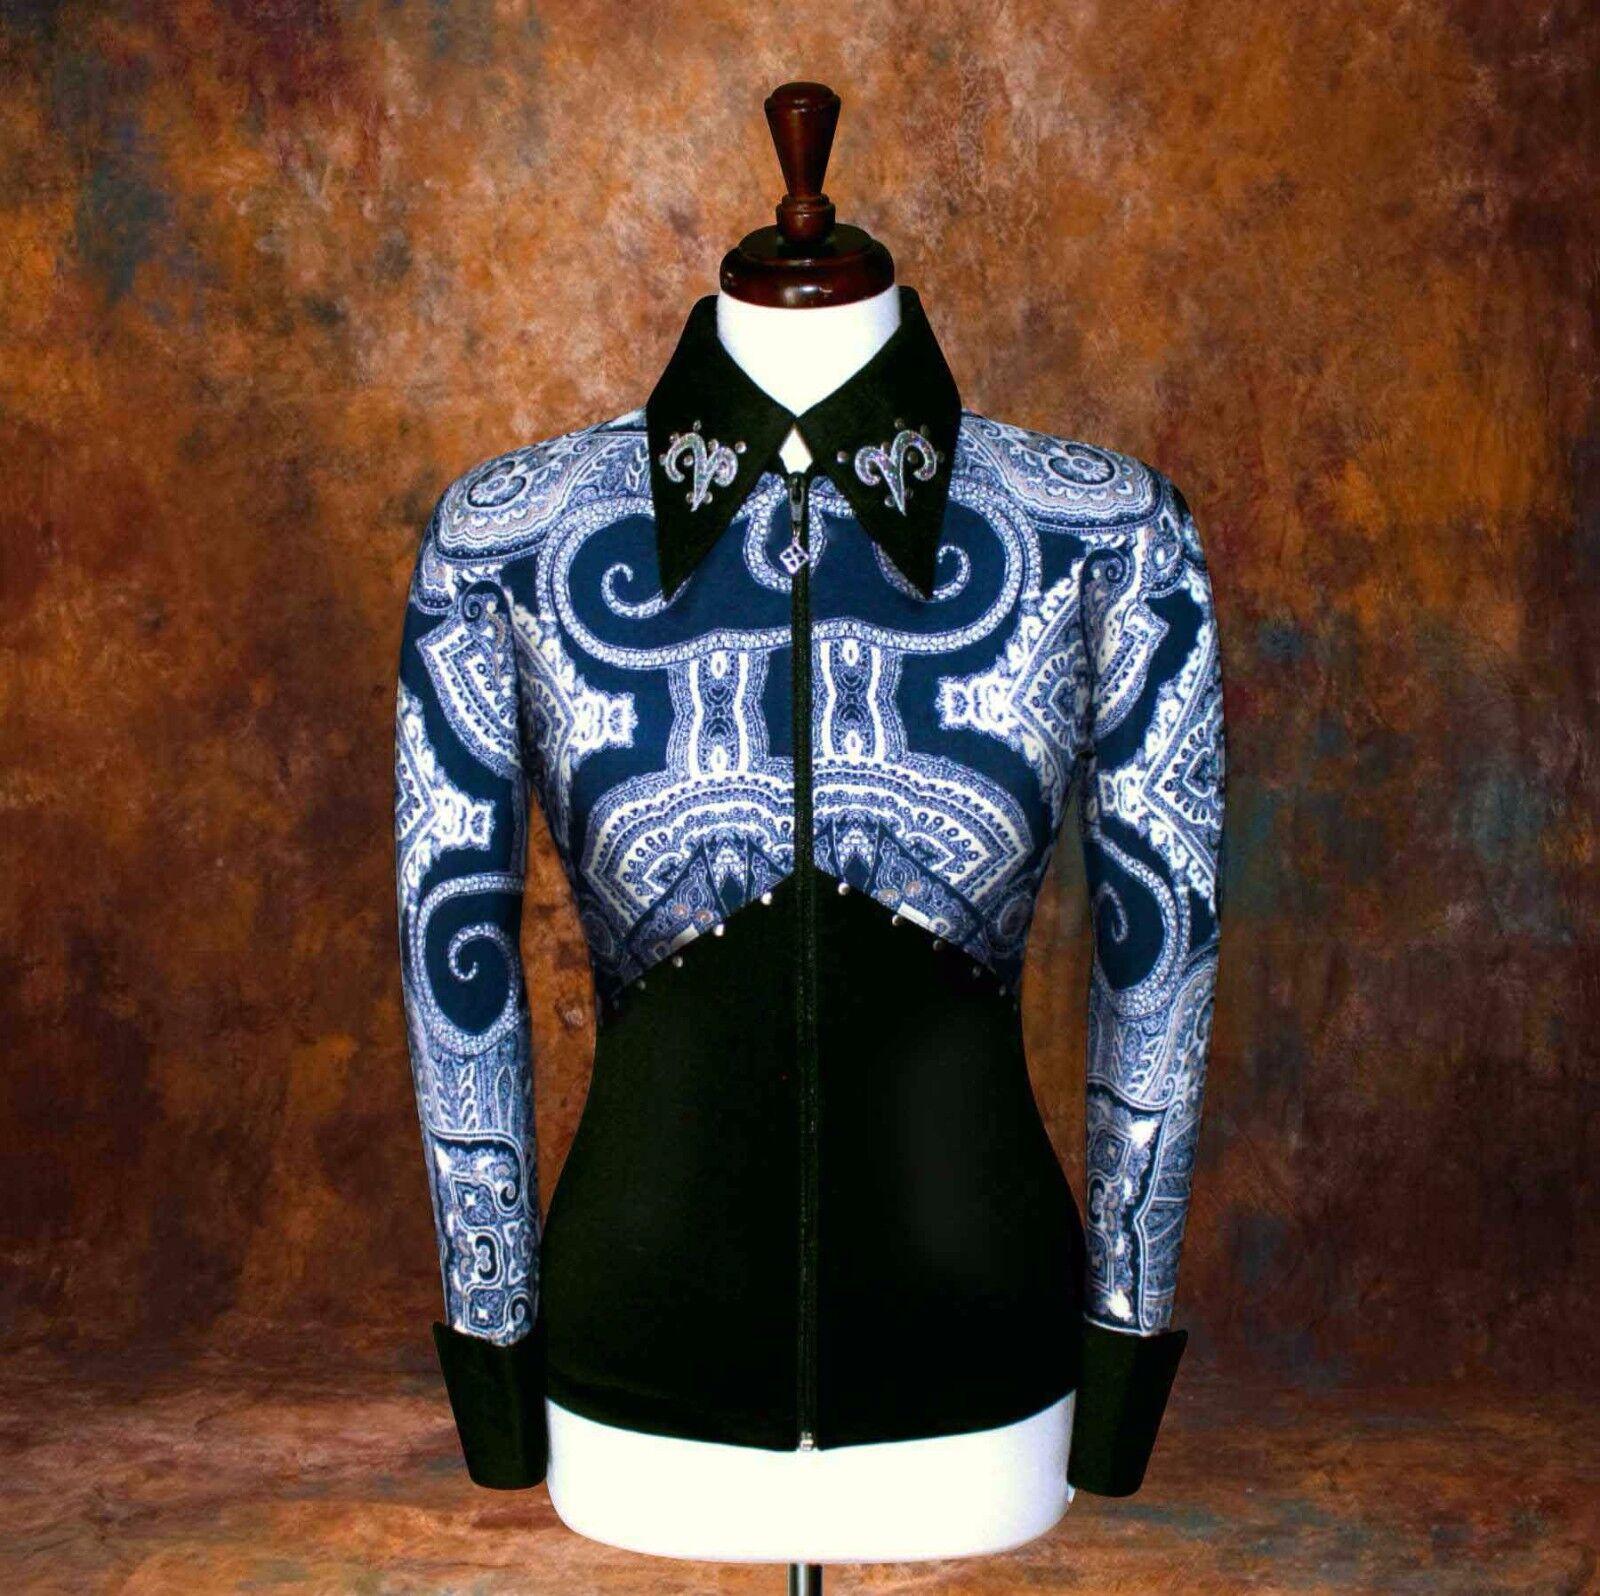 2X-LARGE  Showmanship Pleasure Horsemanship Show Jacket Rail Shirt Rodeo Queen